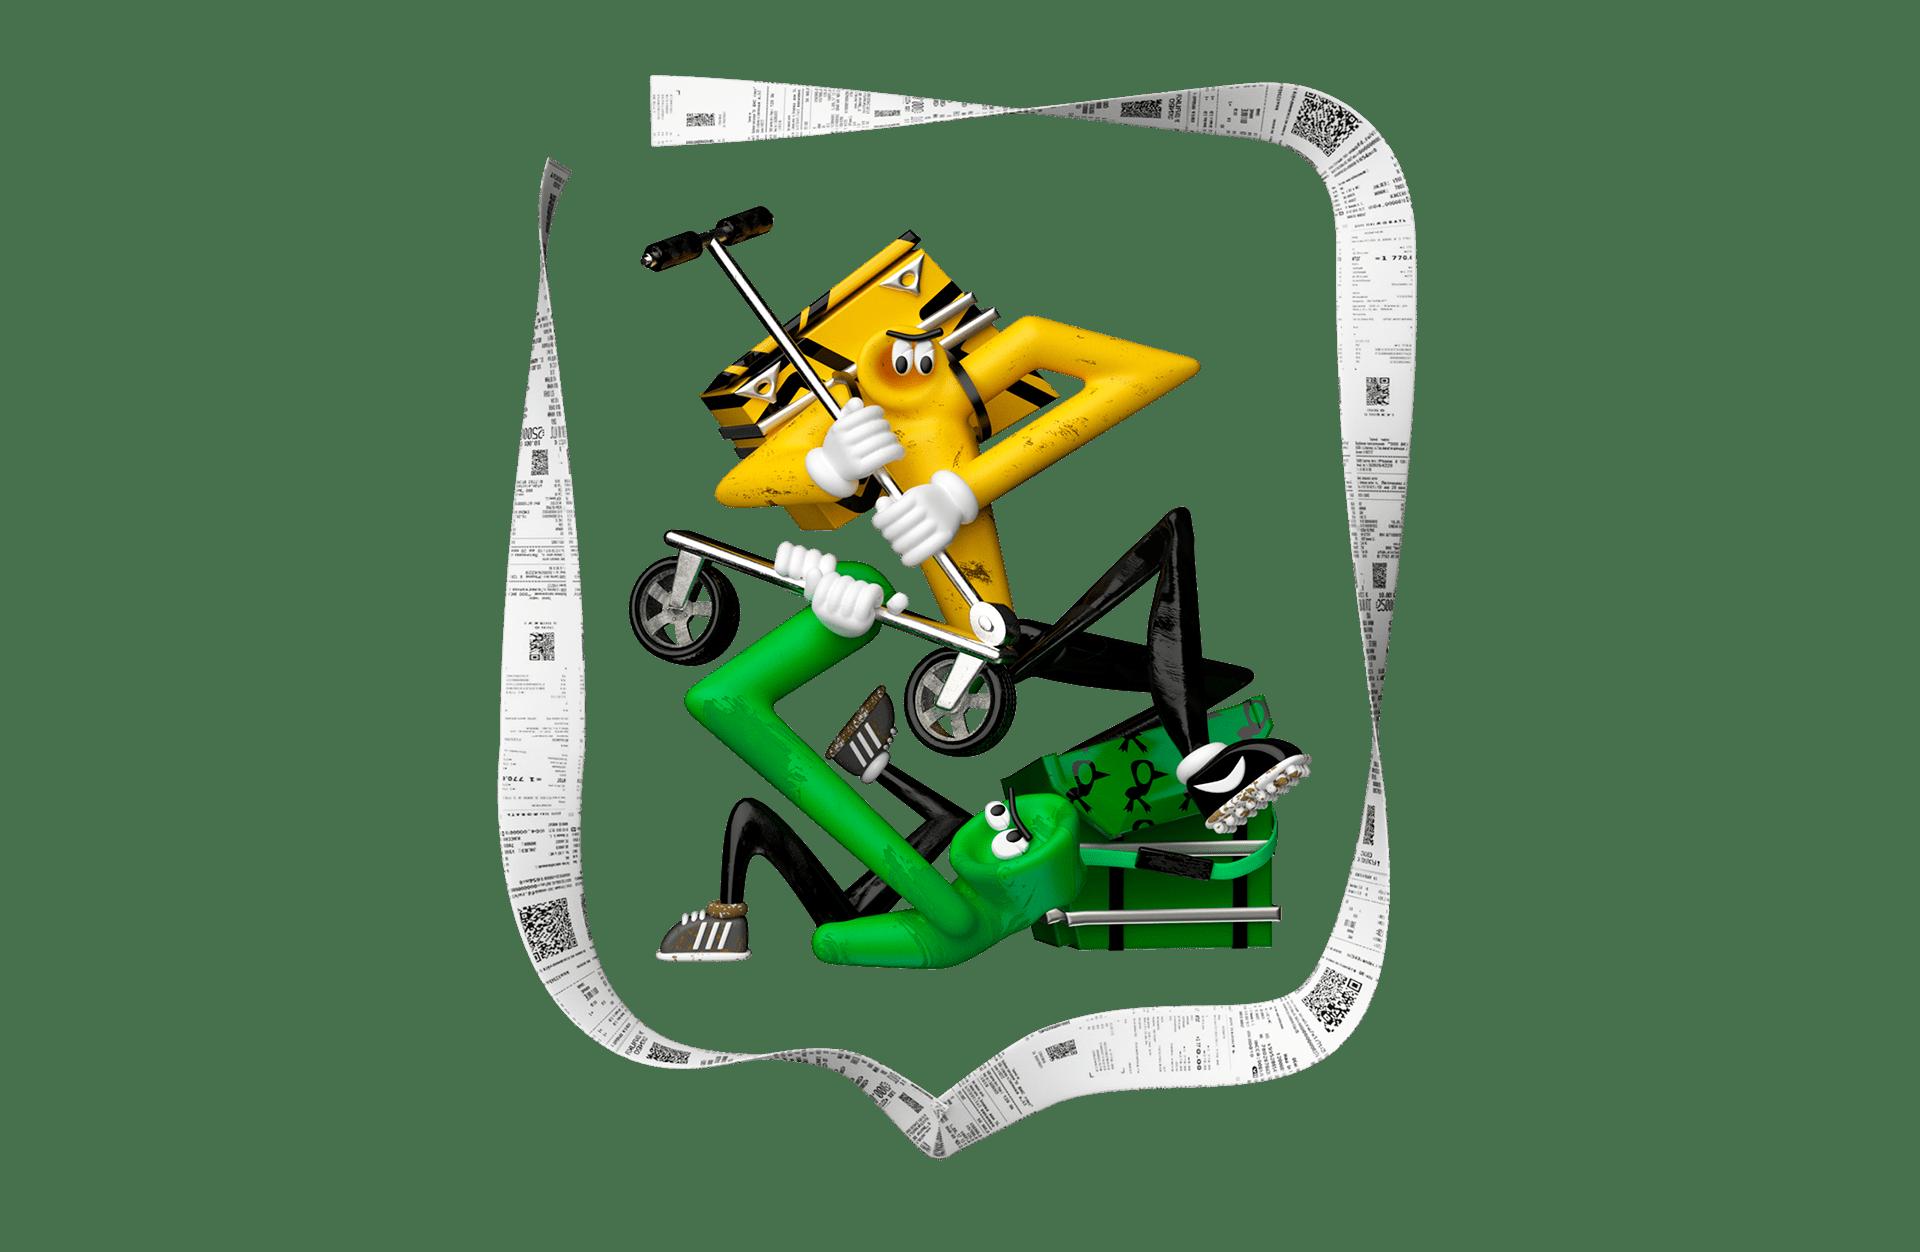 09 - Новый герб Москвы